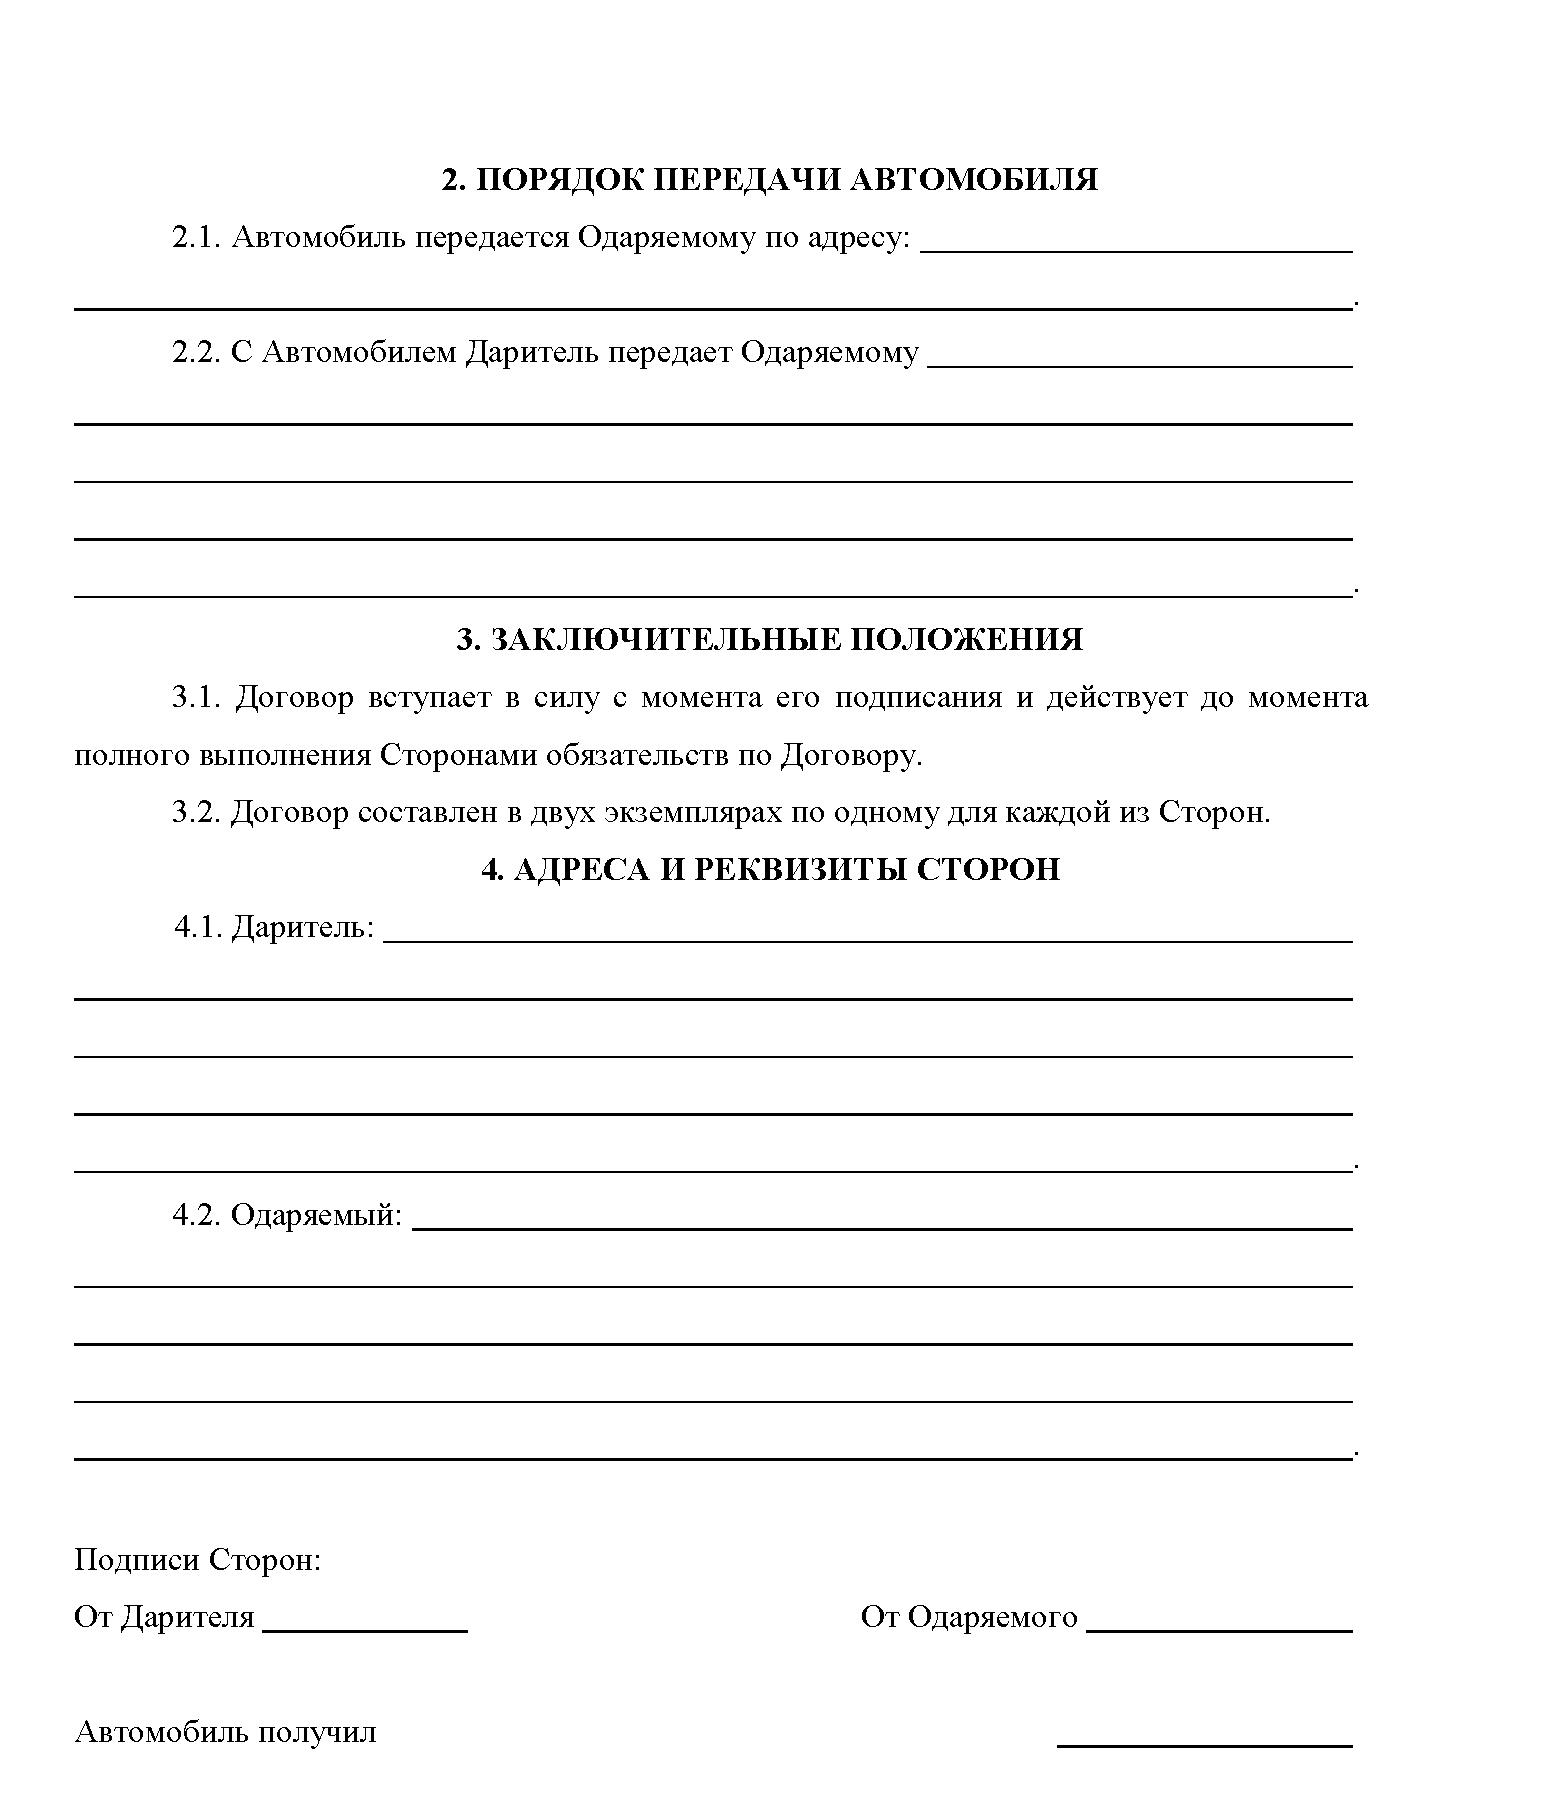 срок договора микрозайма